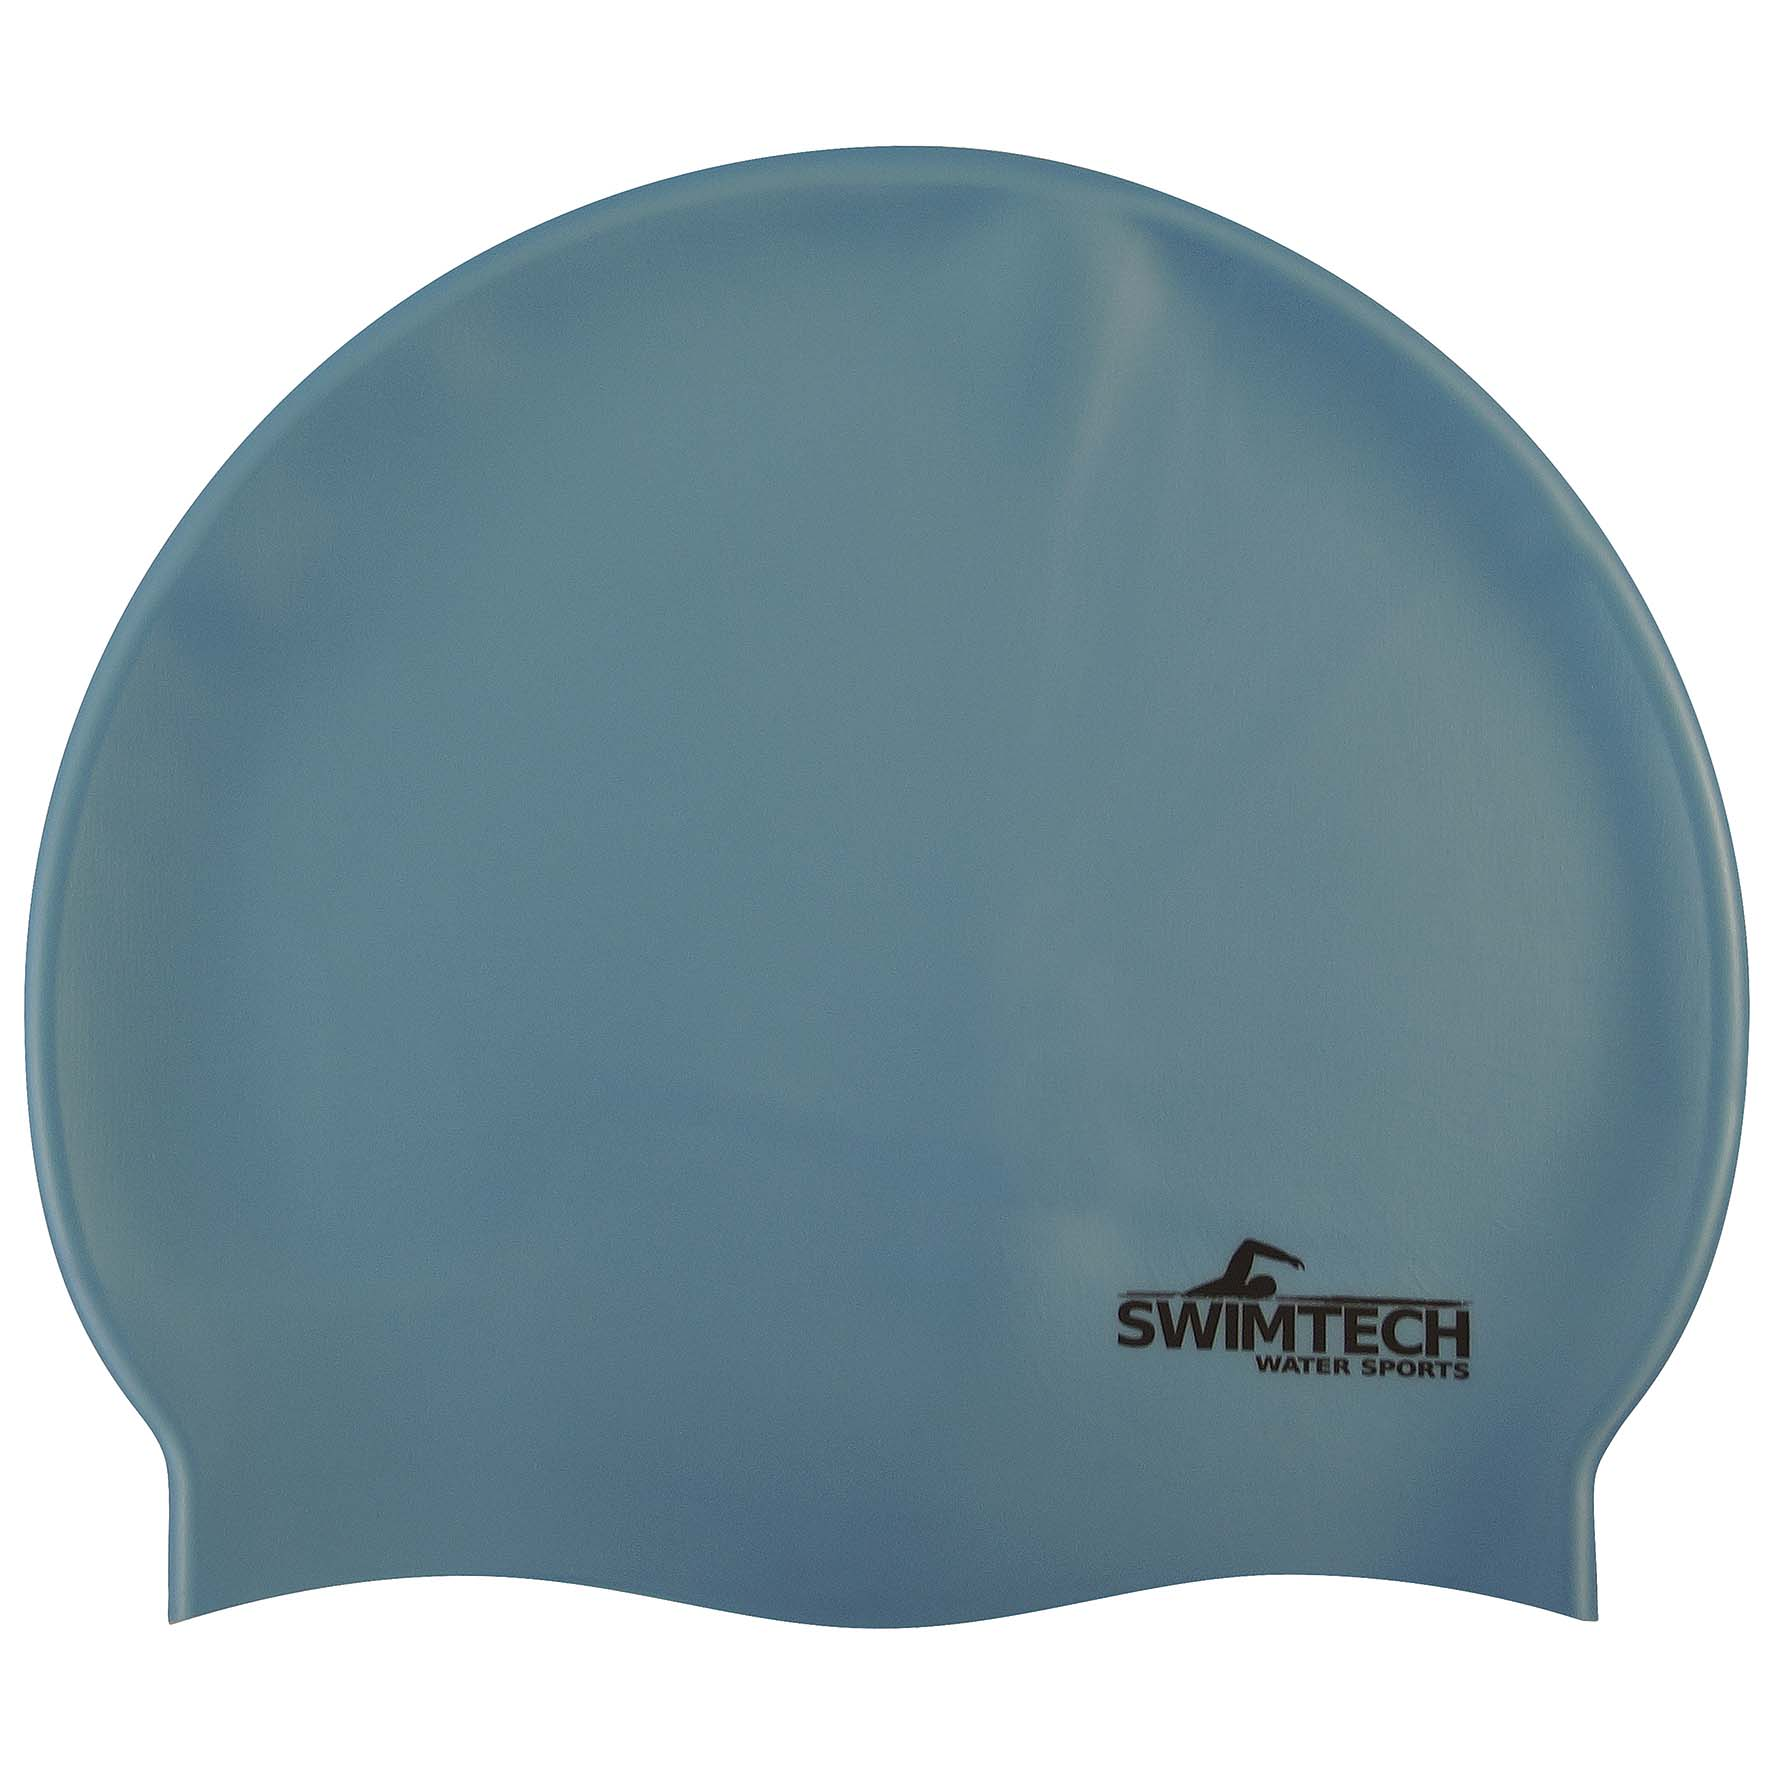 Swimtech Silicone Swim Cap Adults Swimming Pool Caps Rrp 9 Ebay